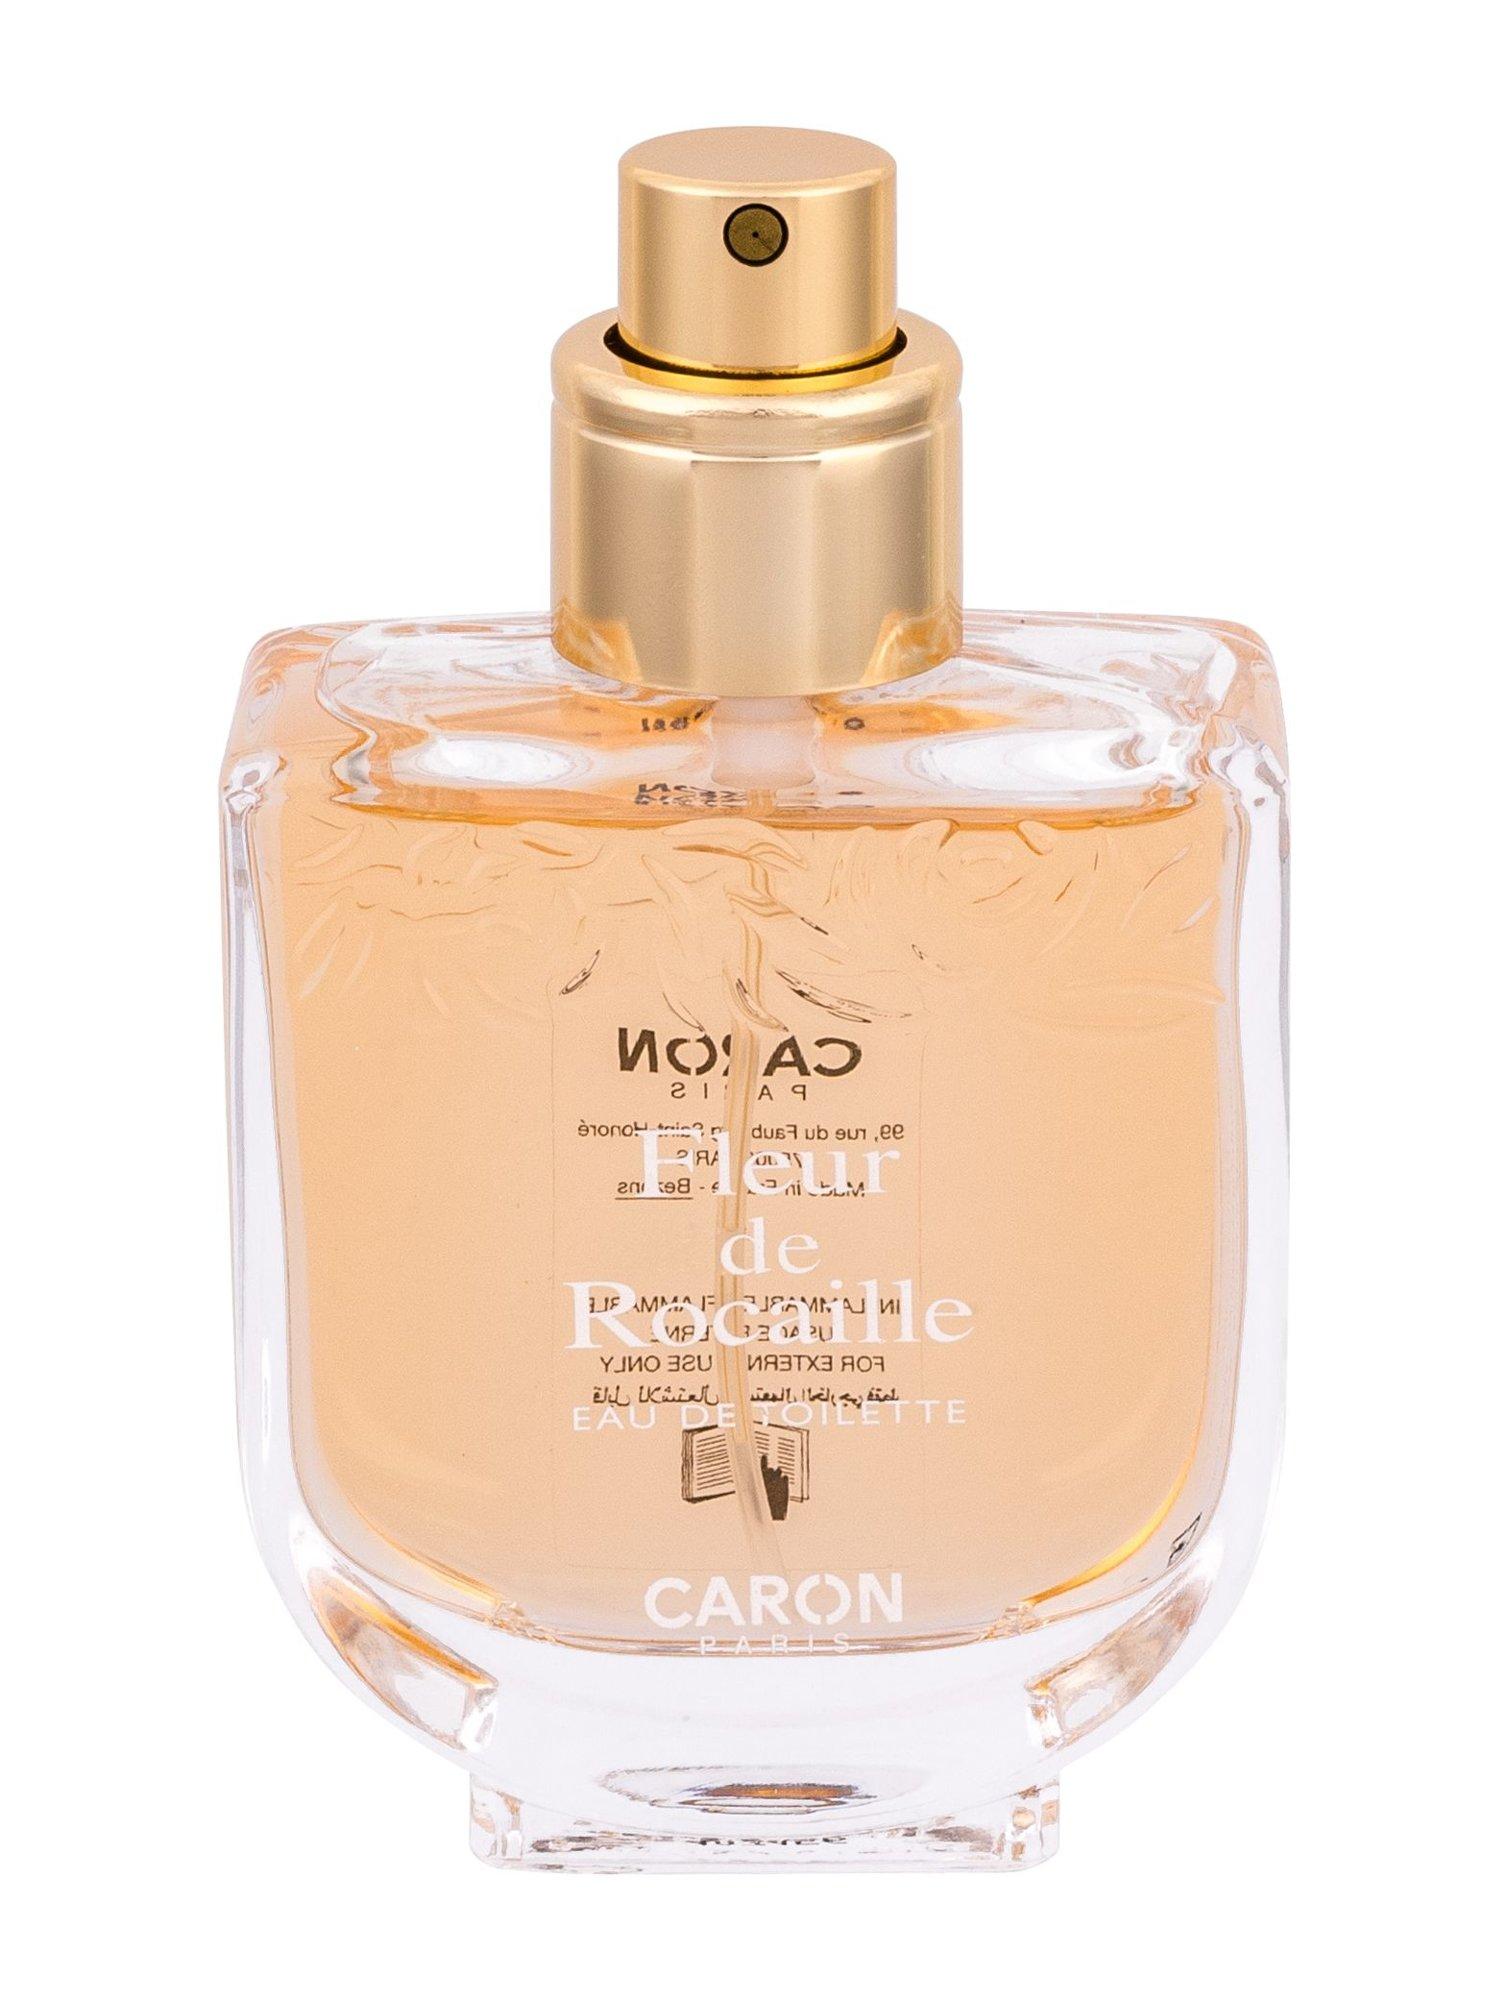 Caron Fleur de Rocaille EDT 50ml